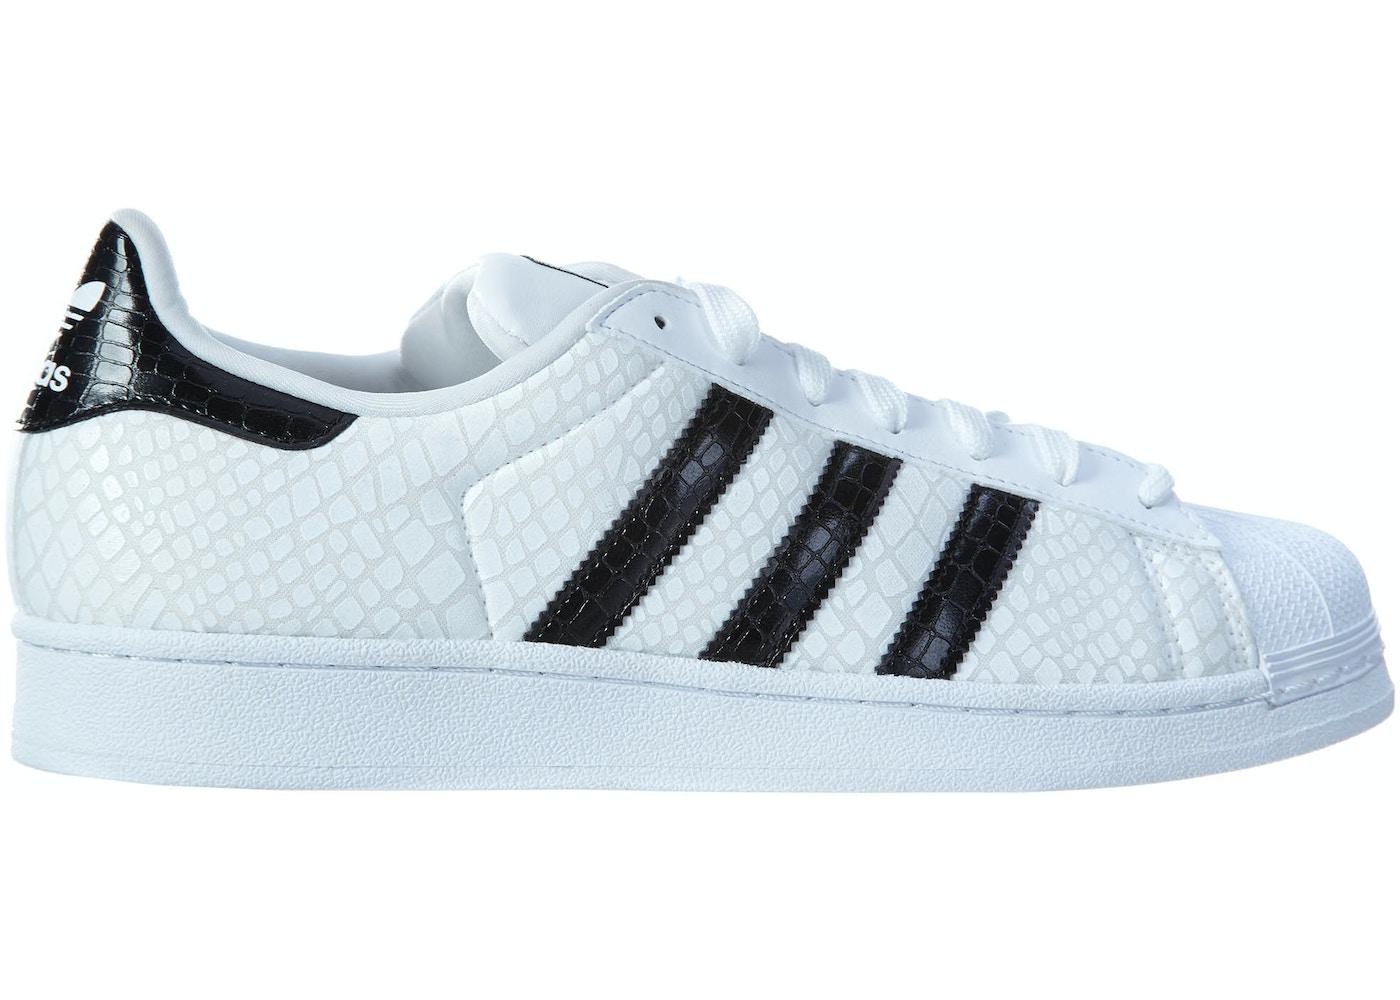 adidas Superstar C White Black-White